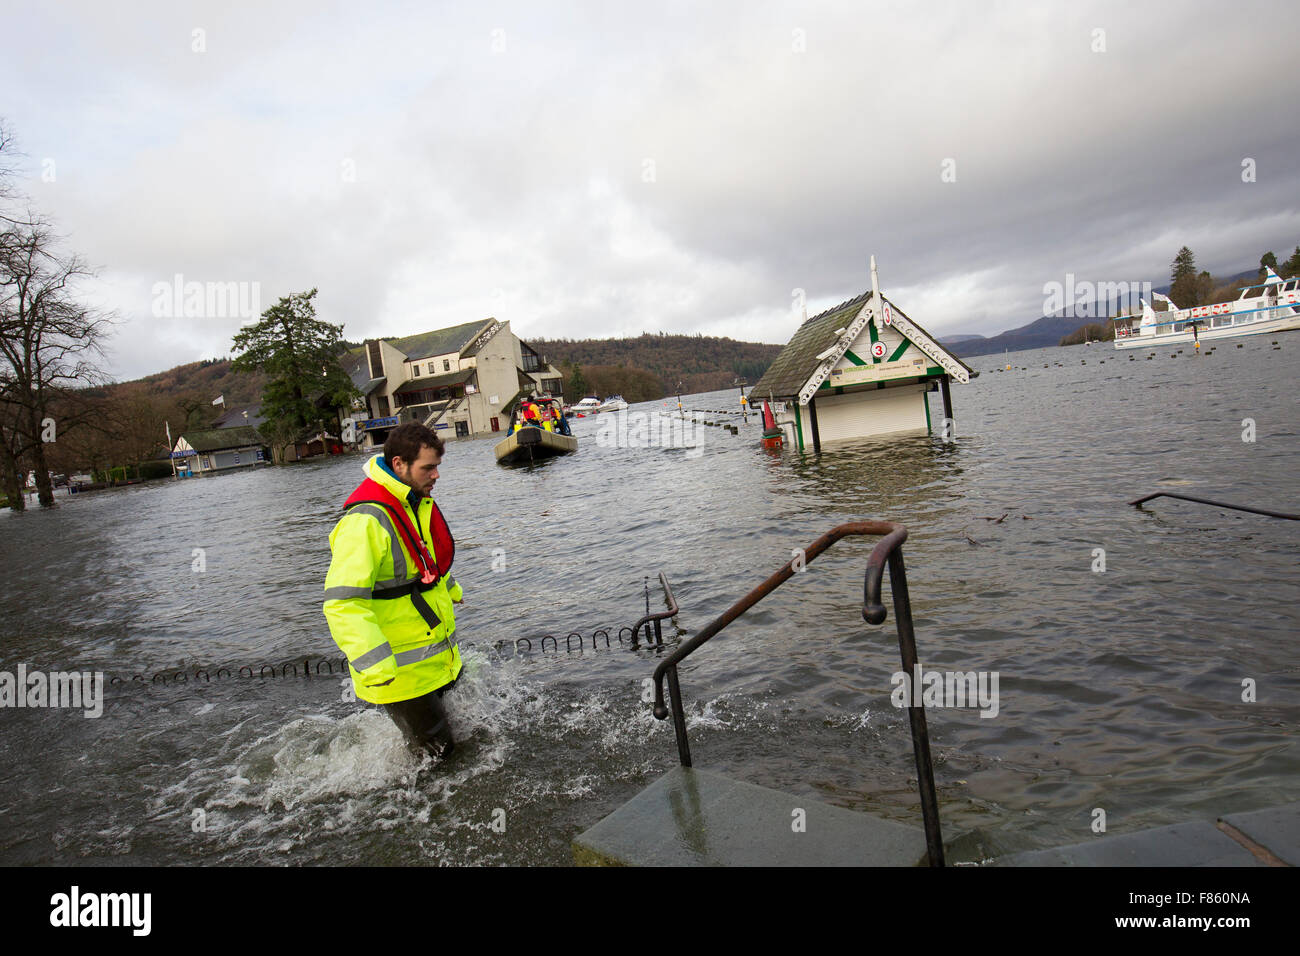 cumbria flood bride battles - HD1300×956